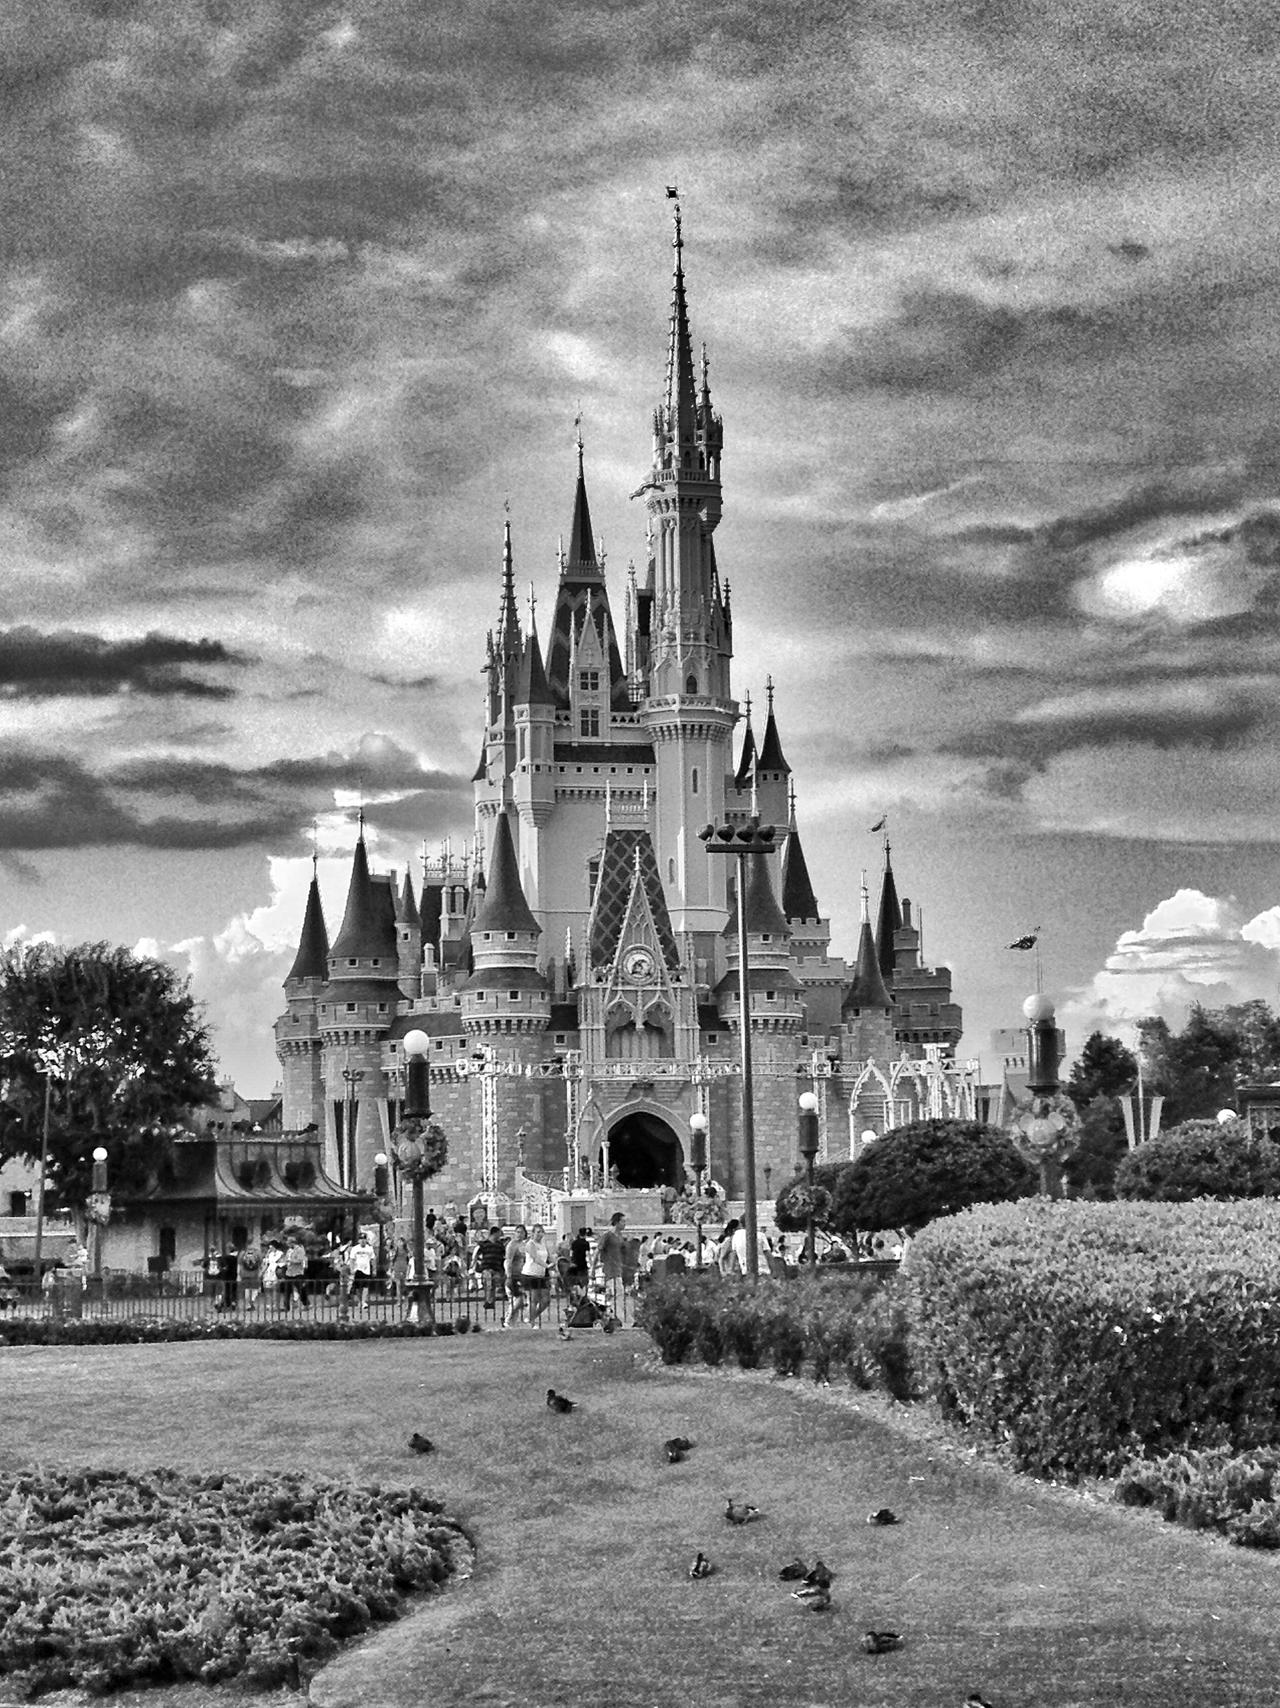 Cinderella's Castle by GeneAut